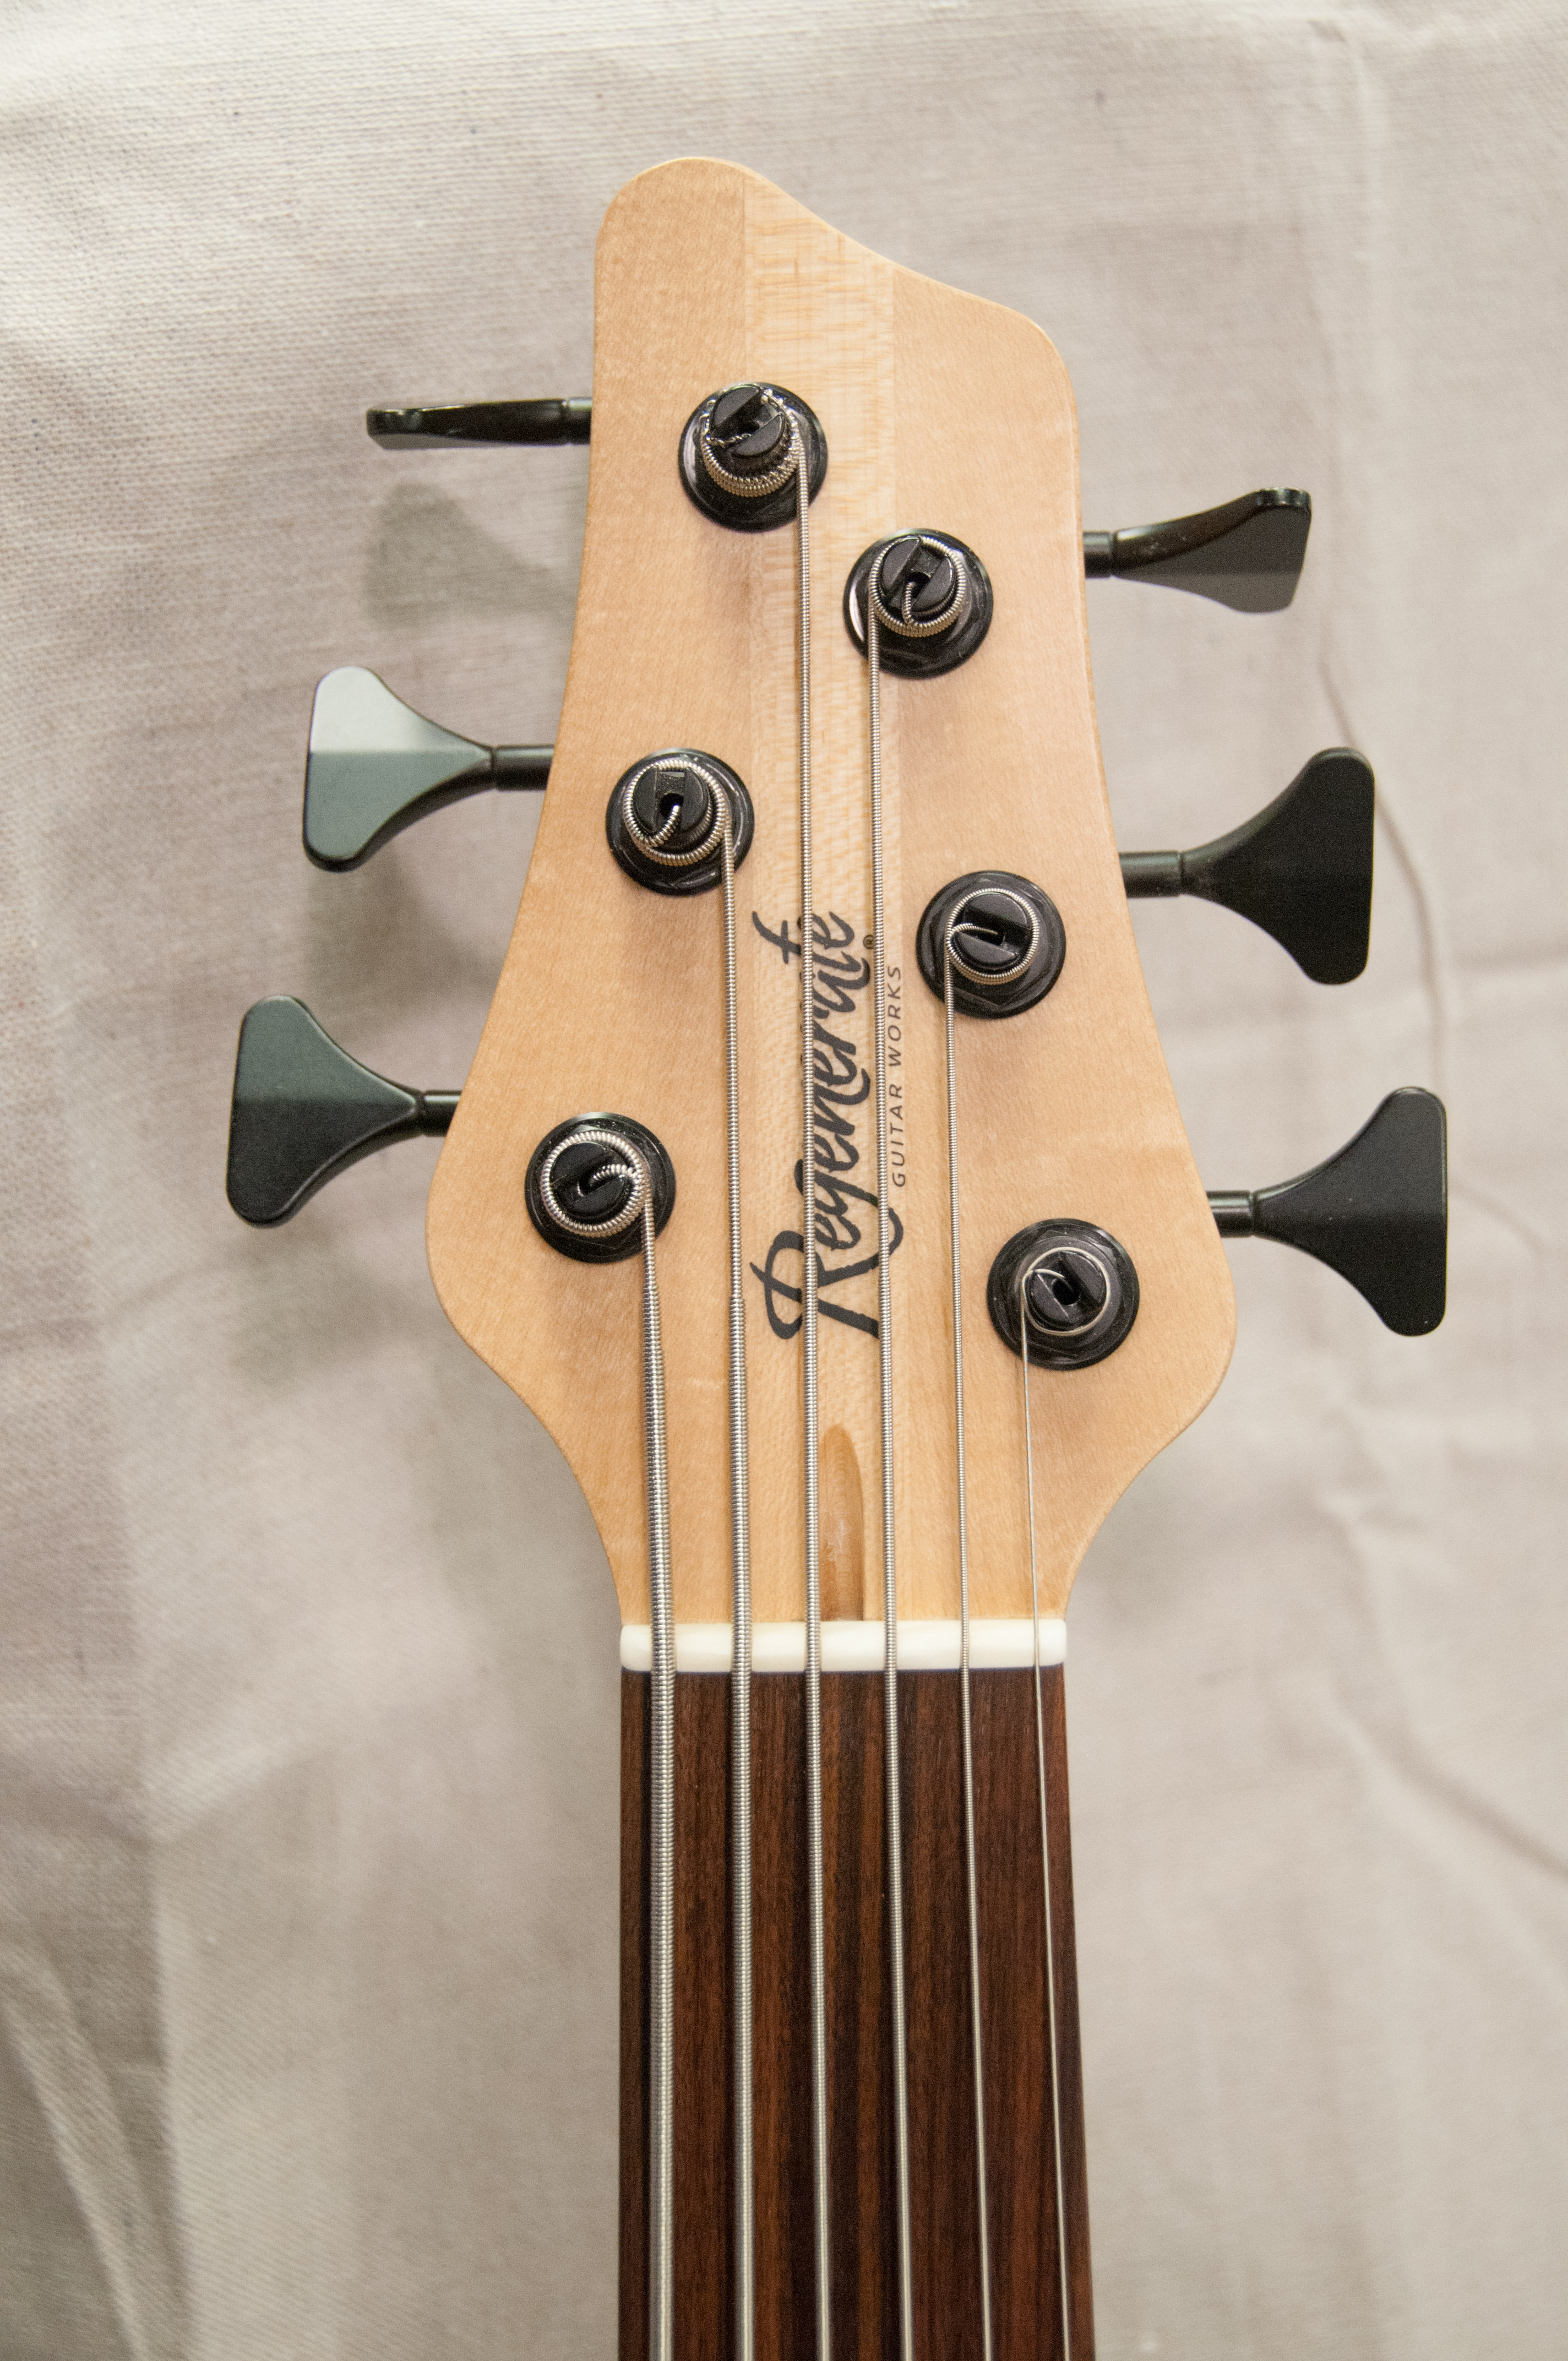 FileRegenerate Malibu Series 6 String Fretless Bass Headstock